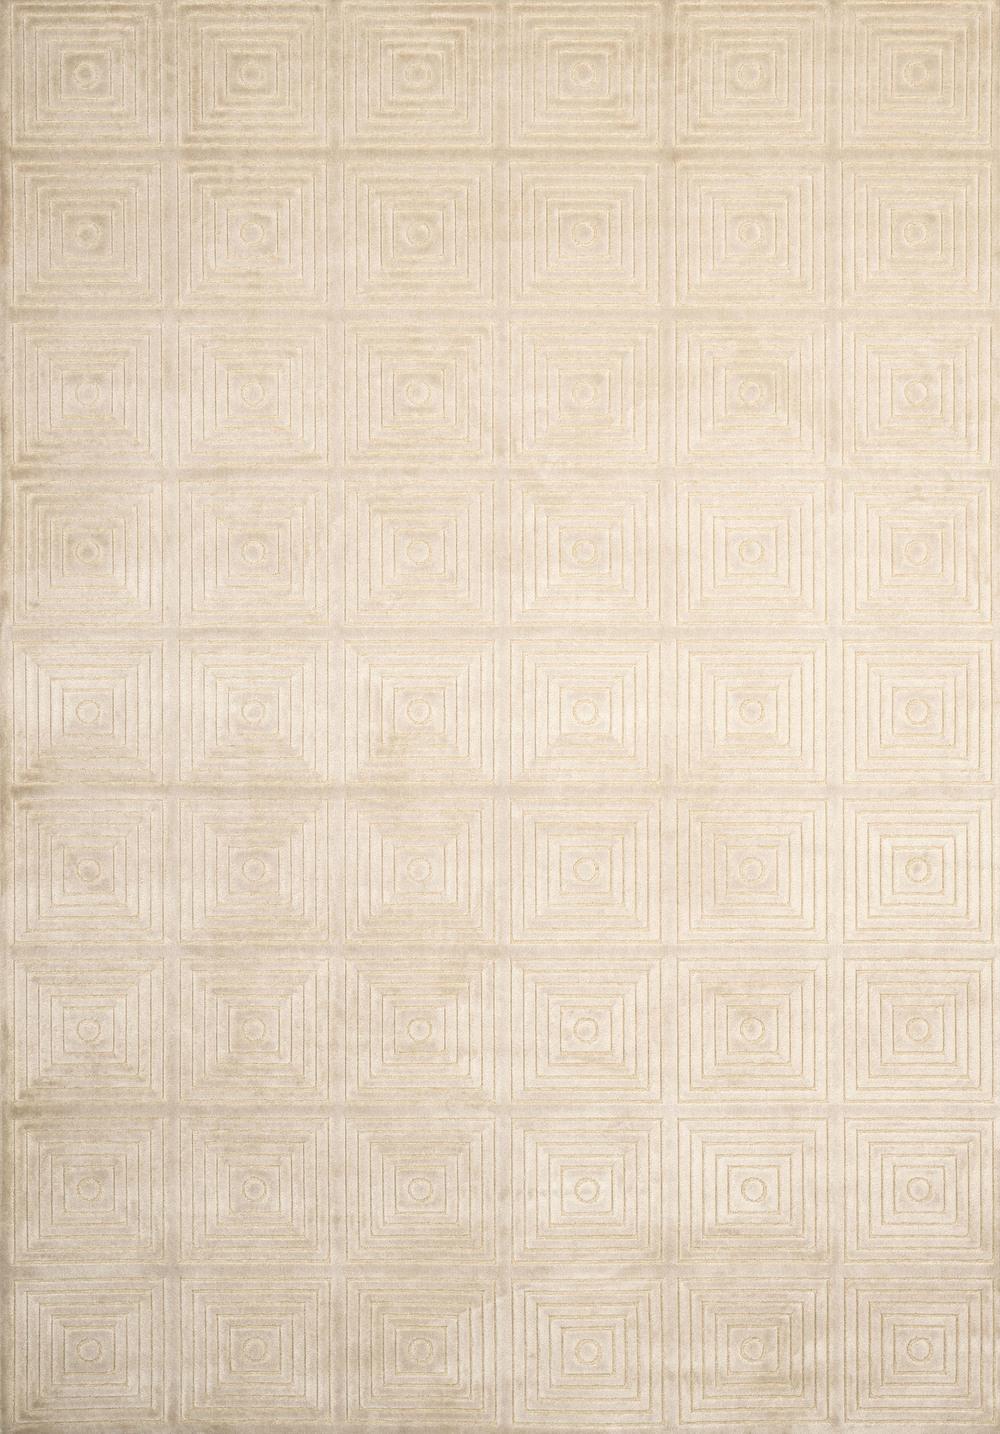 Copy of AVORIO cod. 161